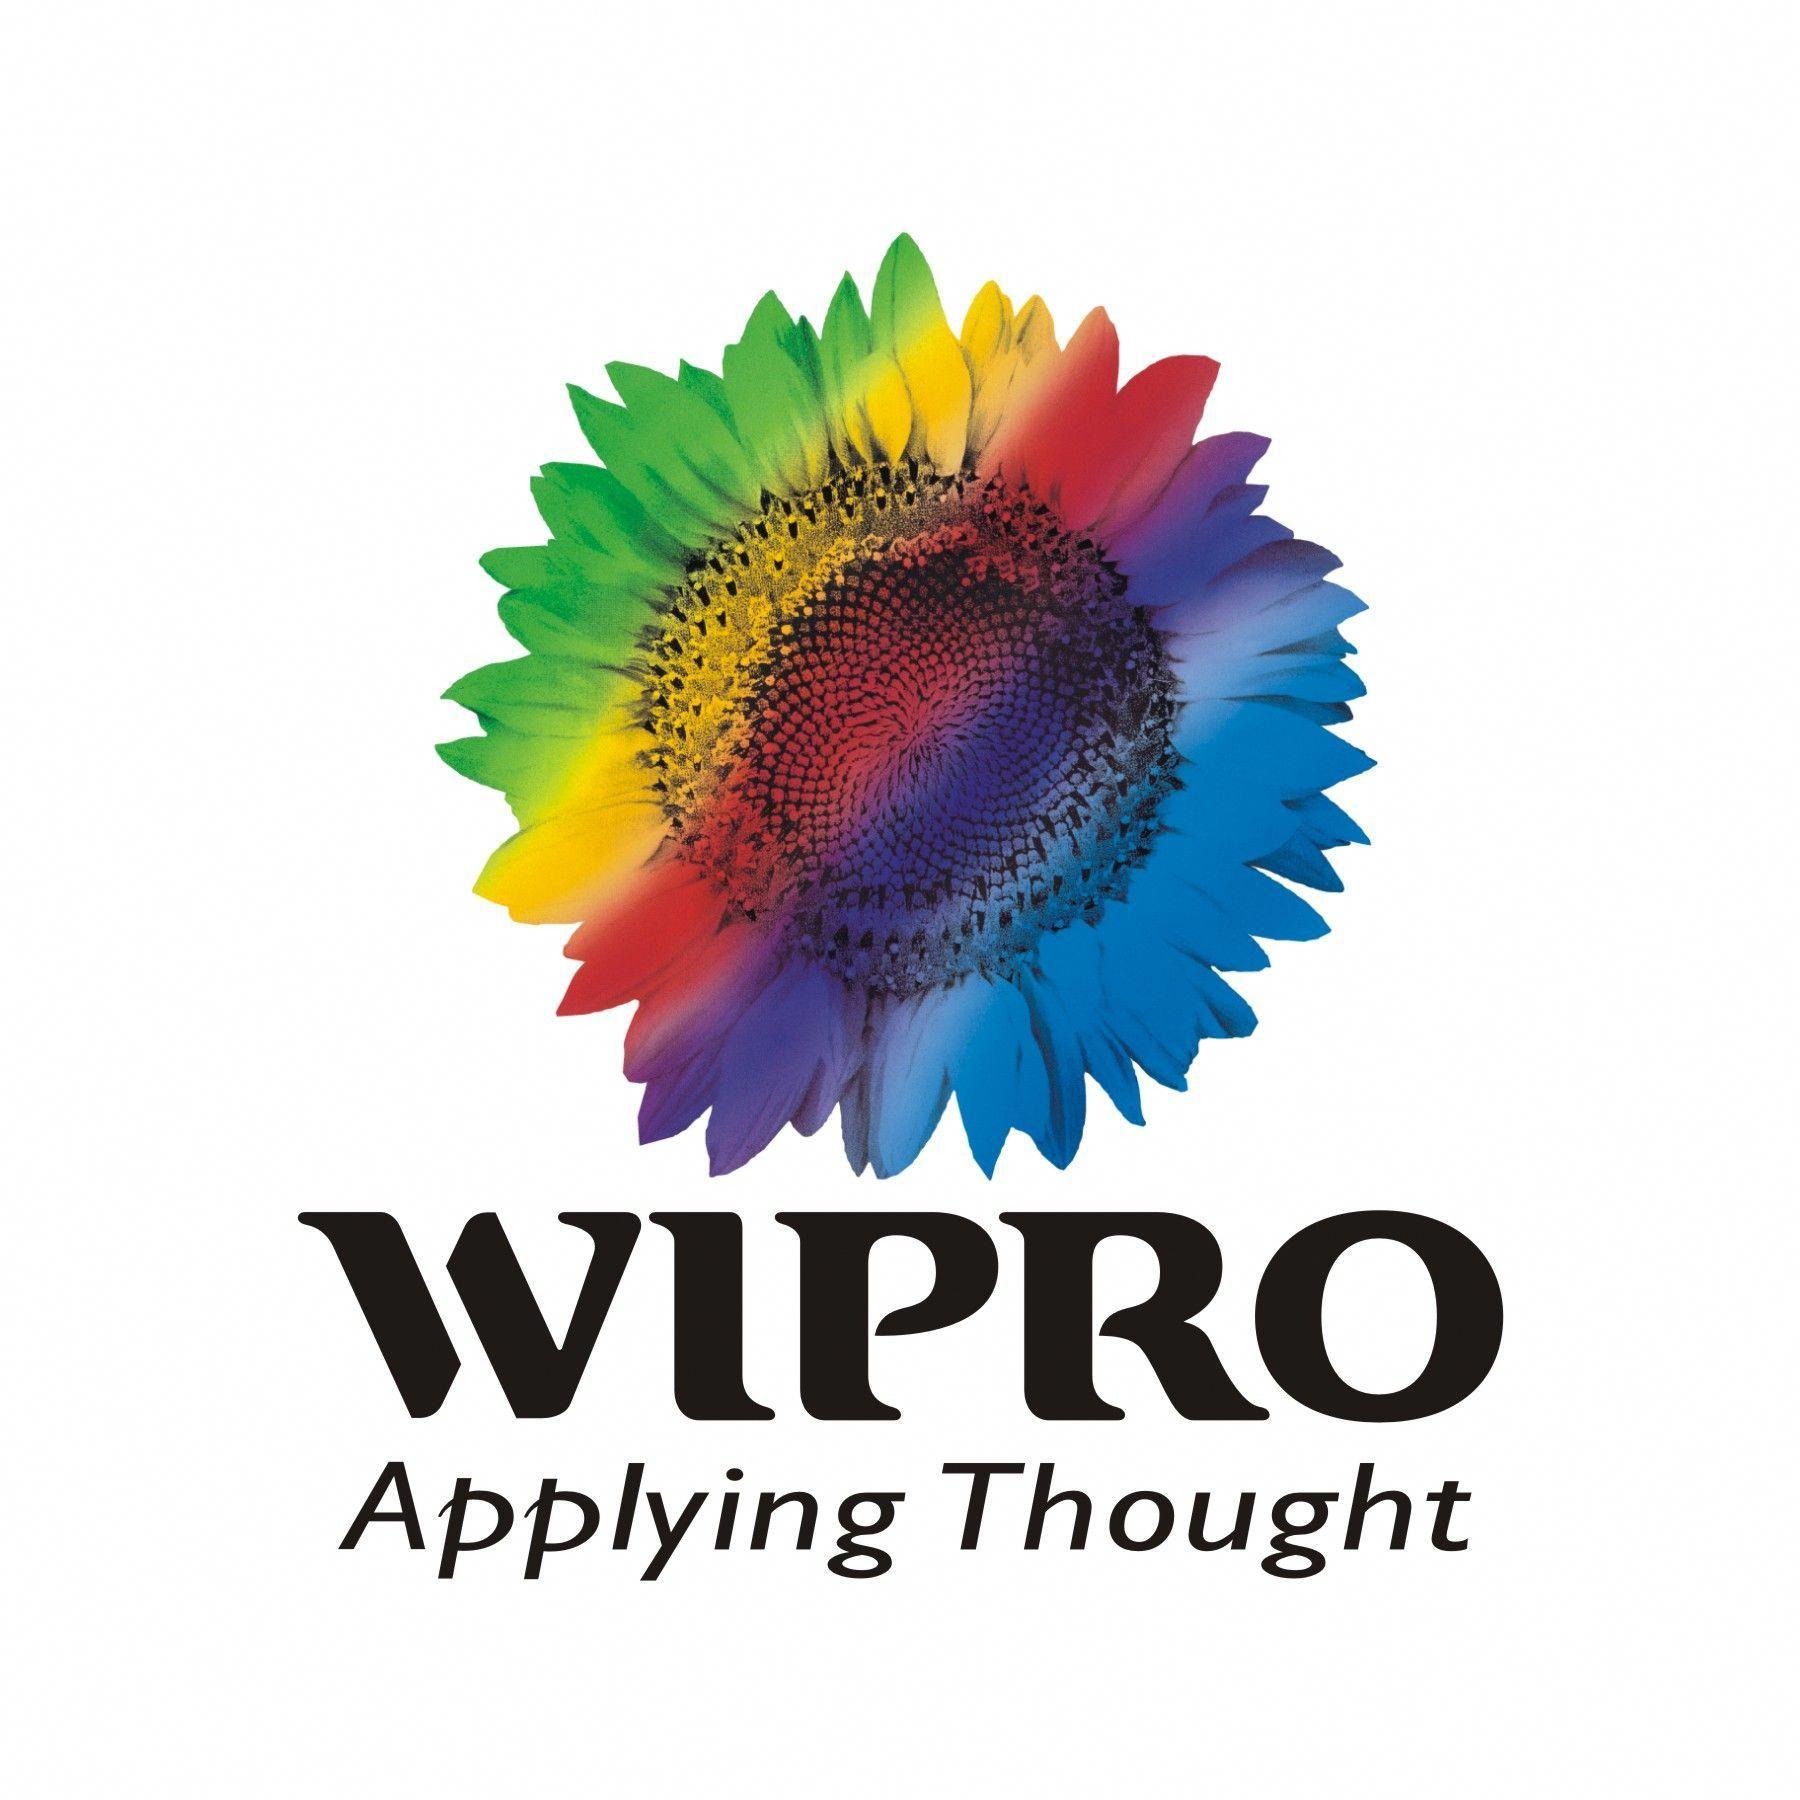 Wipro Ltd., a leading global information technology